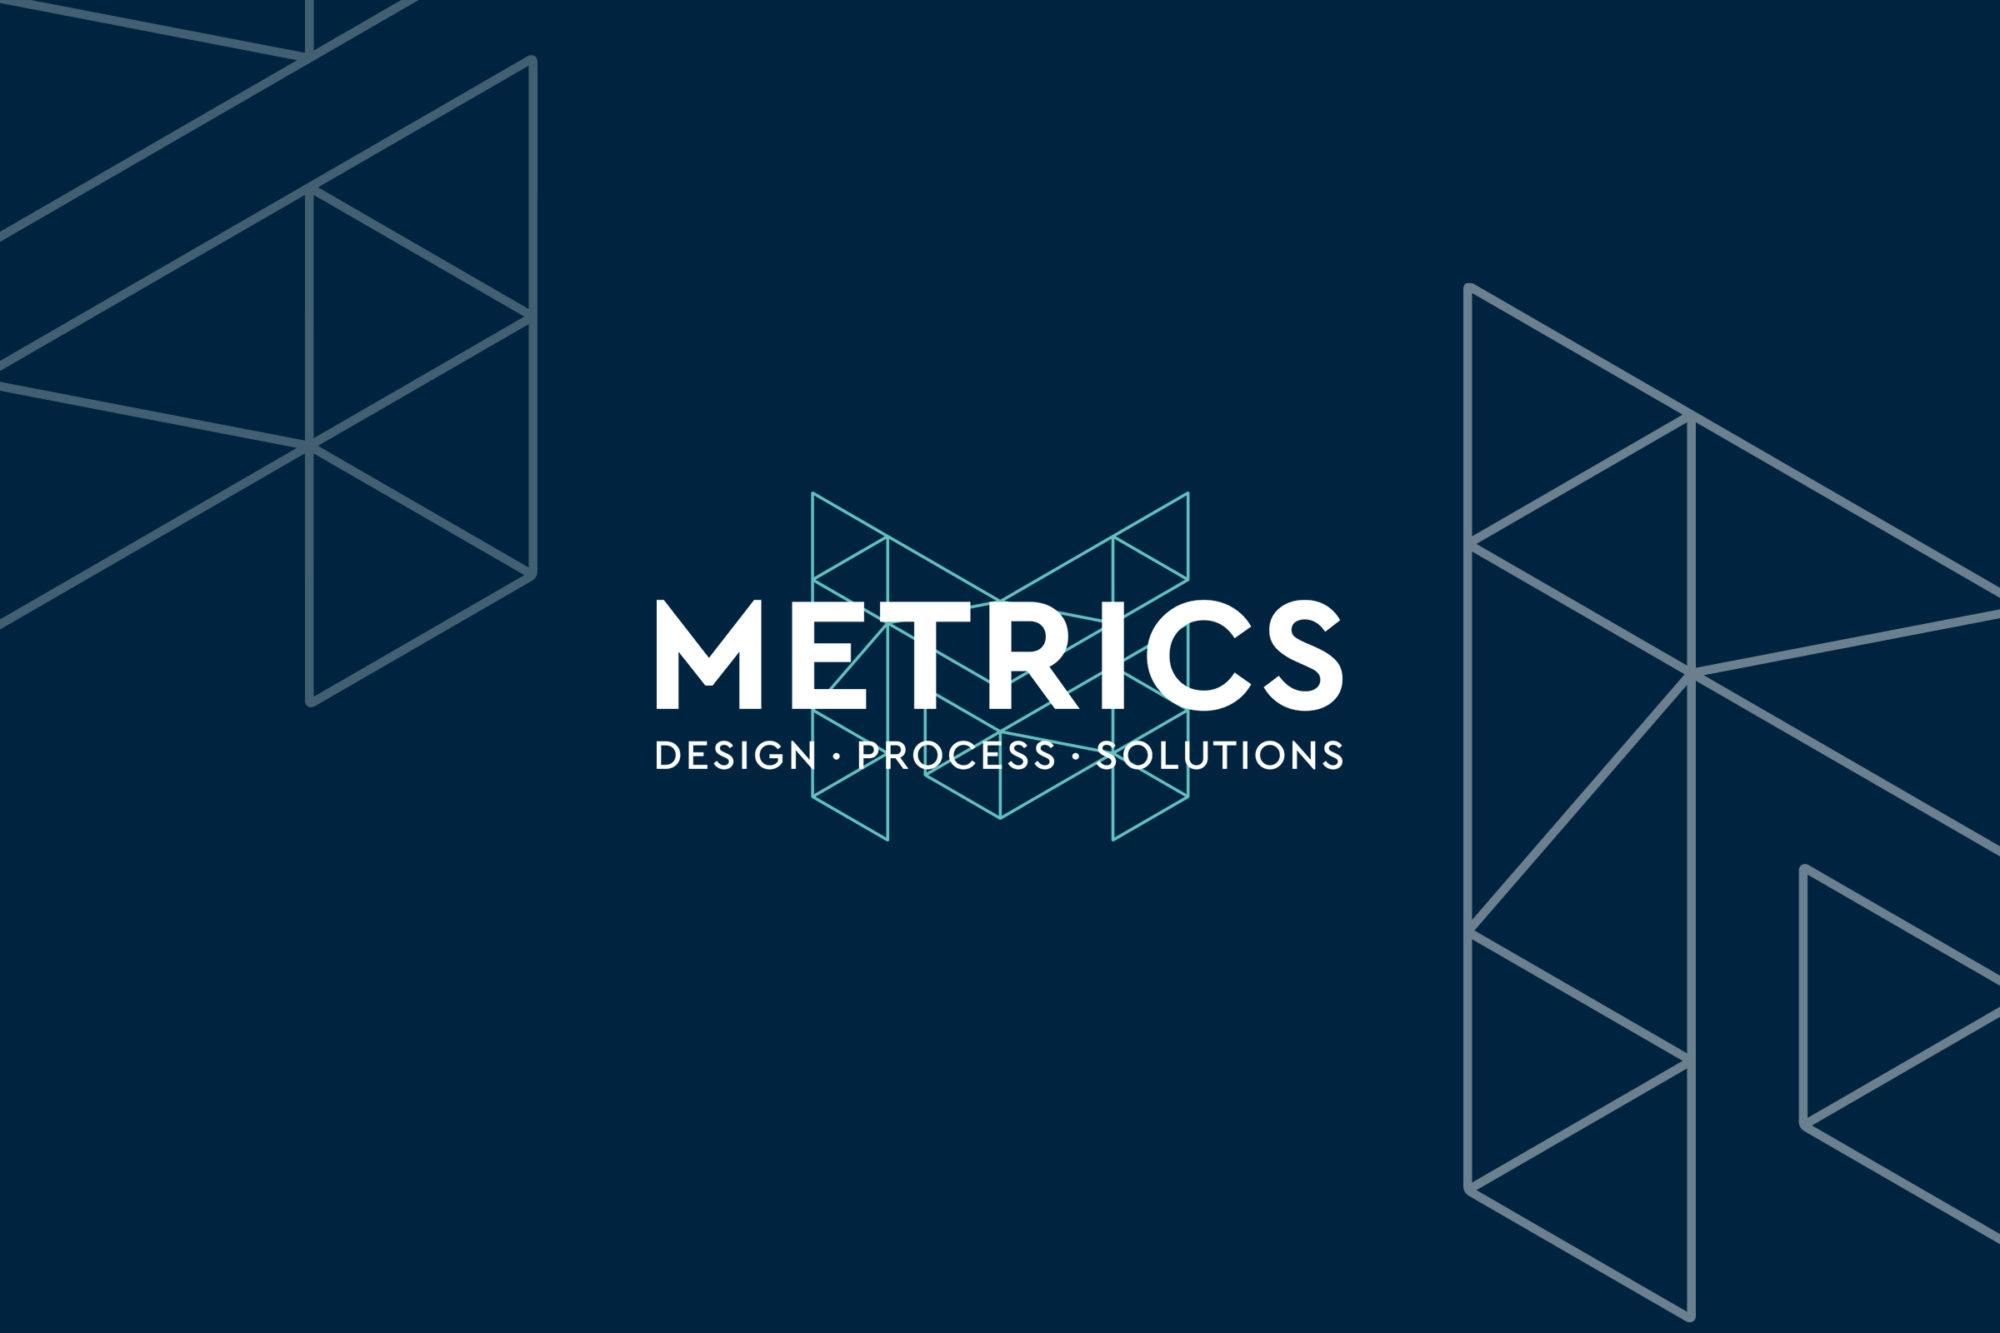 Metrics Design